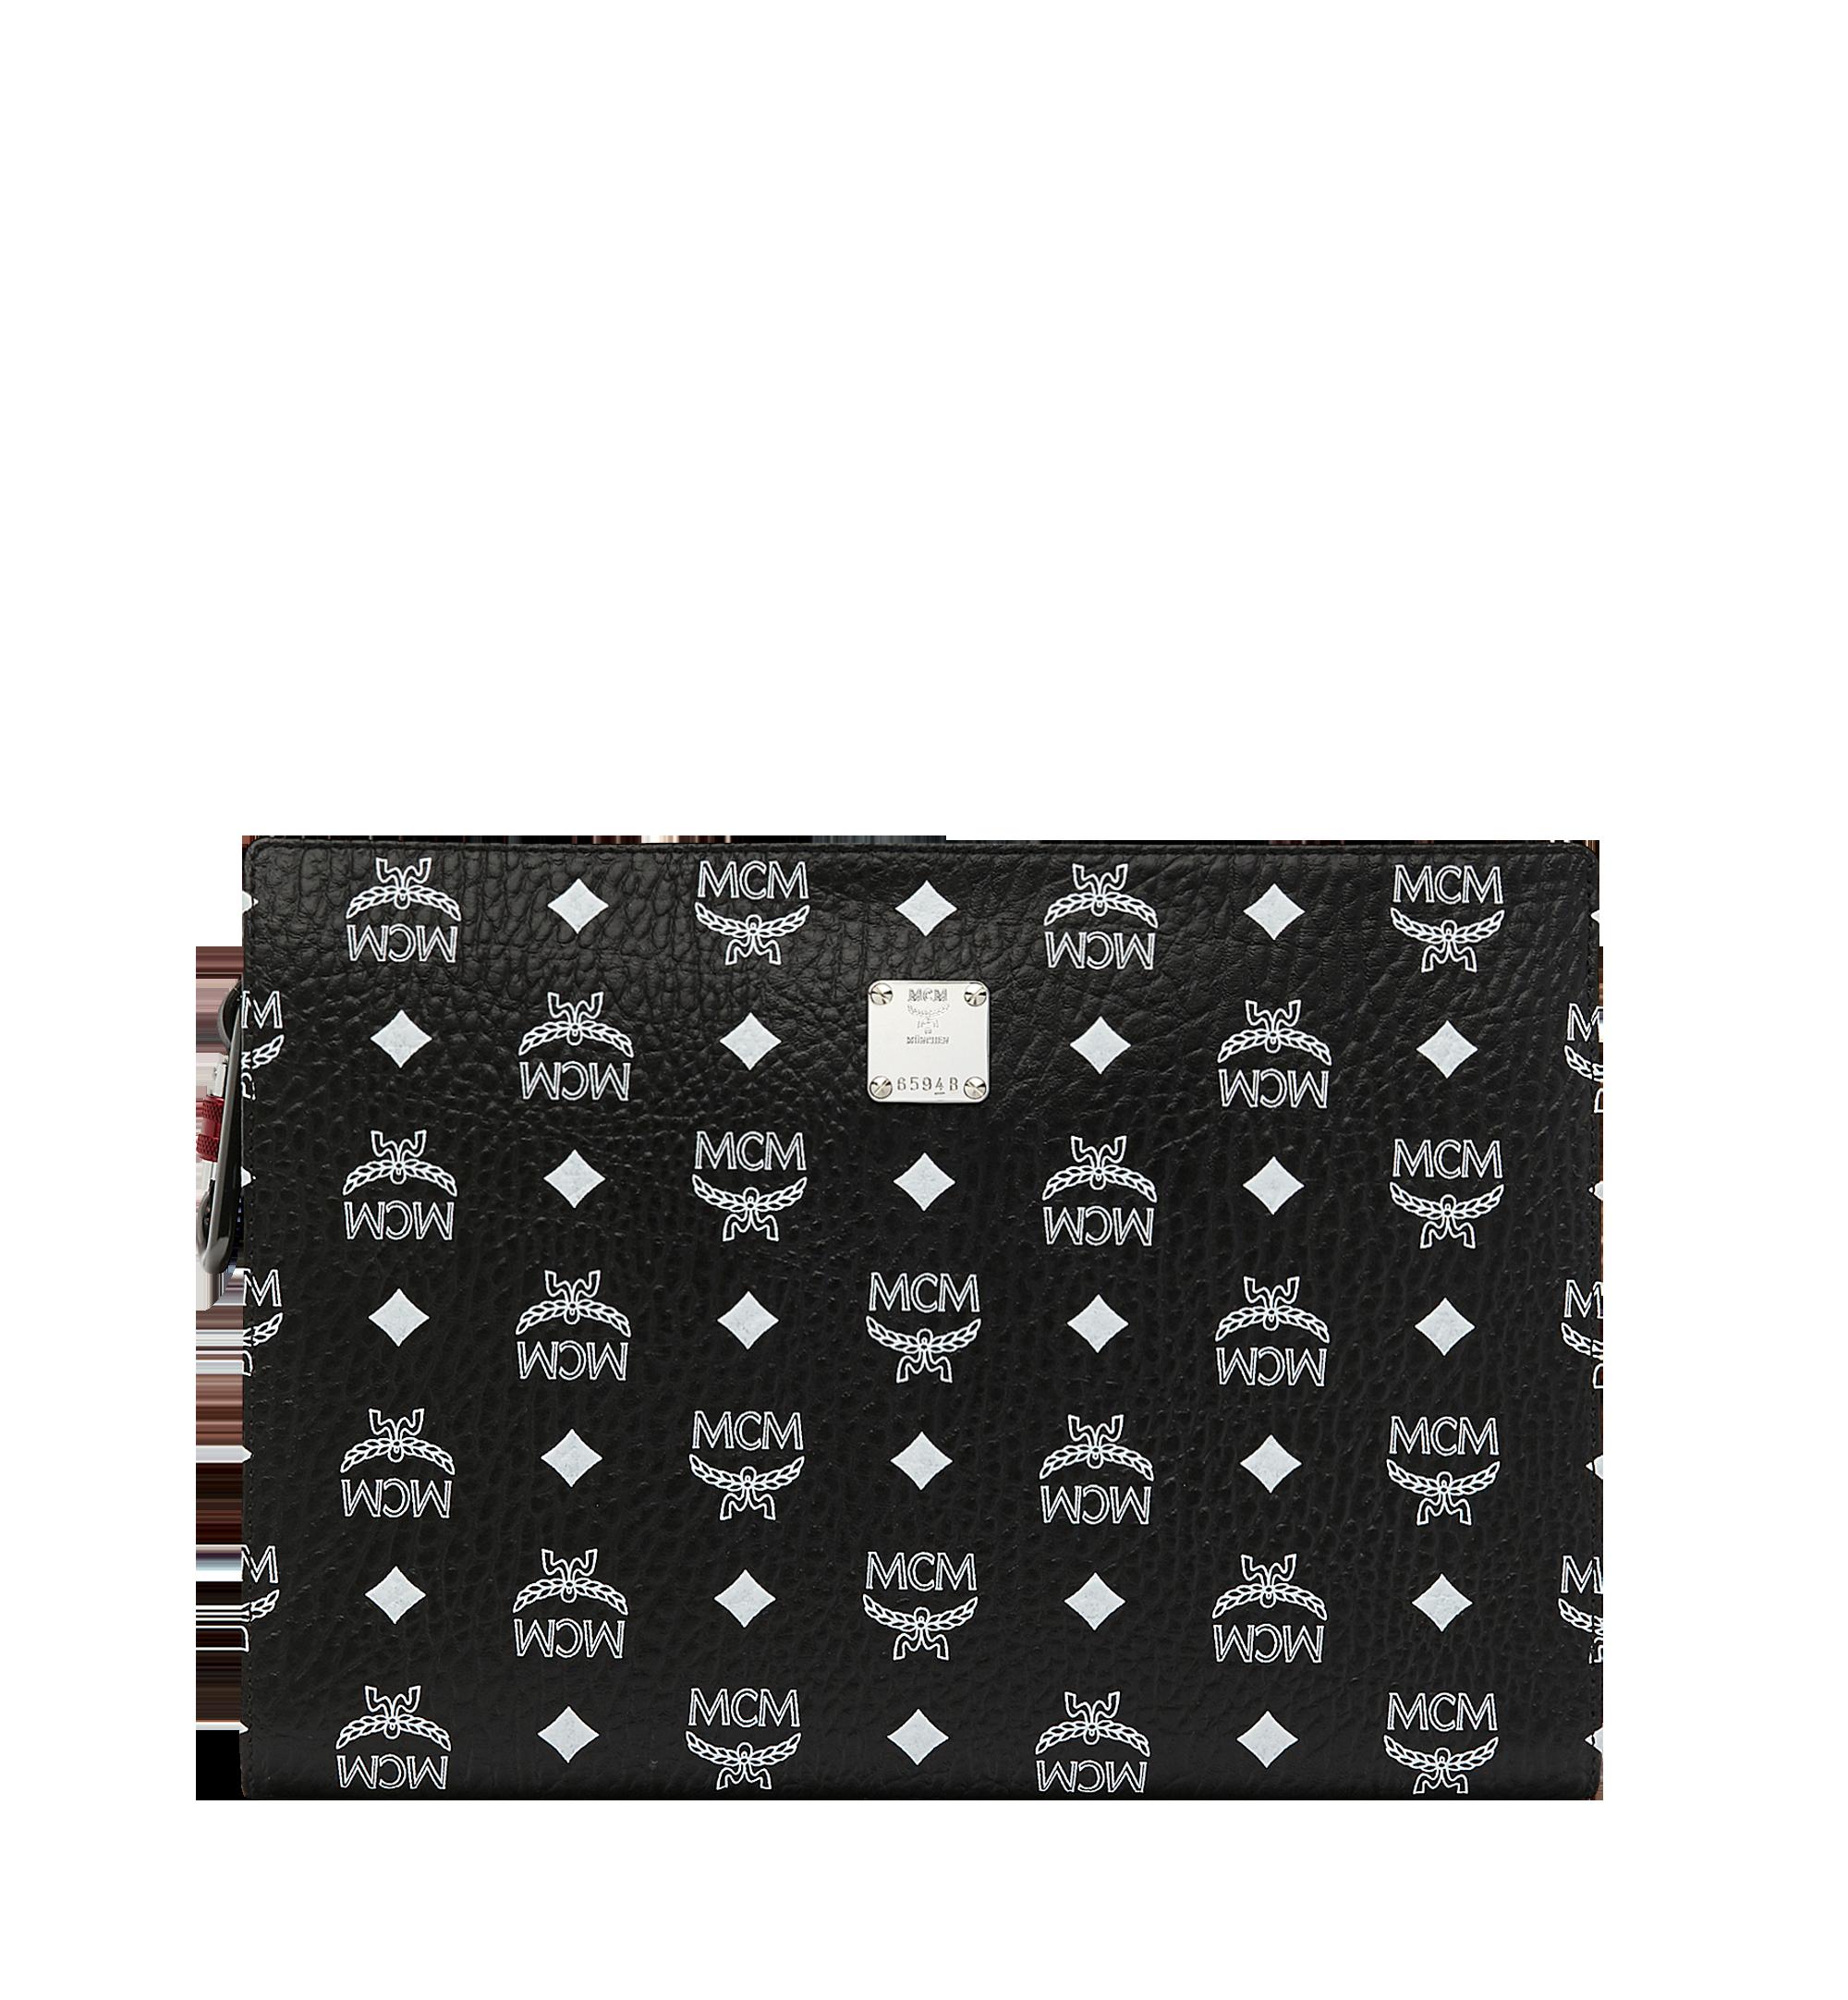 MCM Zip Pouch in White Logo Visetos Black MXZ9SWA04BV001 Alternate View 1